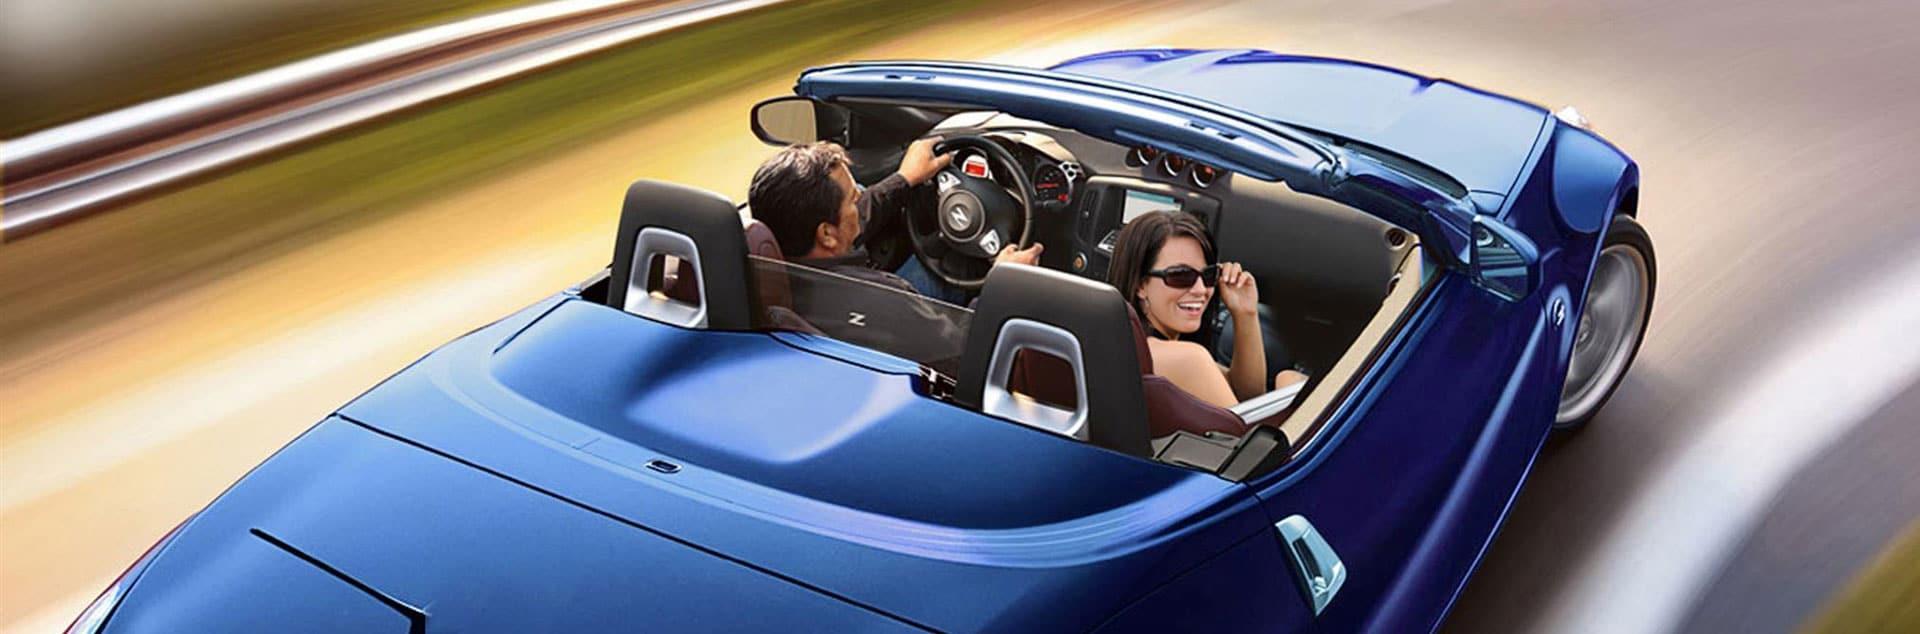 Carsmetics Auto Body Repair Made Easy